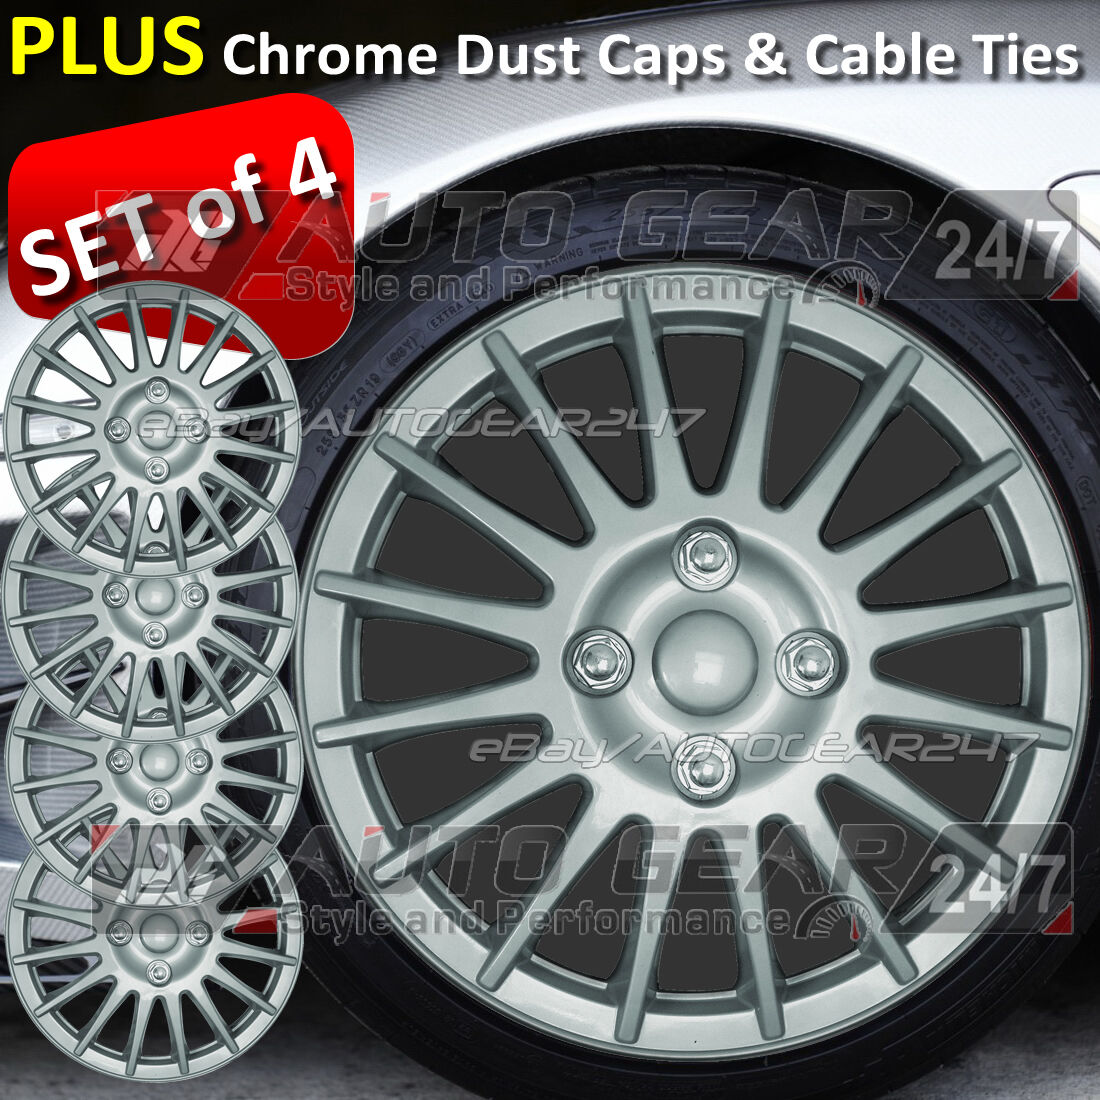 UKB4C 4x Wheel Trims Hub Caps 15 Covers fits Seat Ibiza Leon Toledo Alhambra Altea Black /& Silver Alloy Look